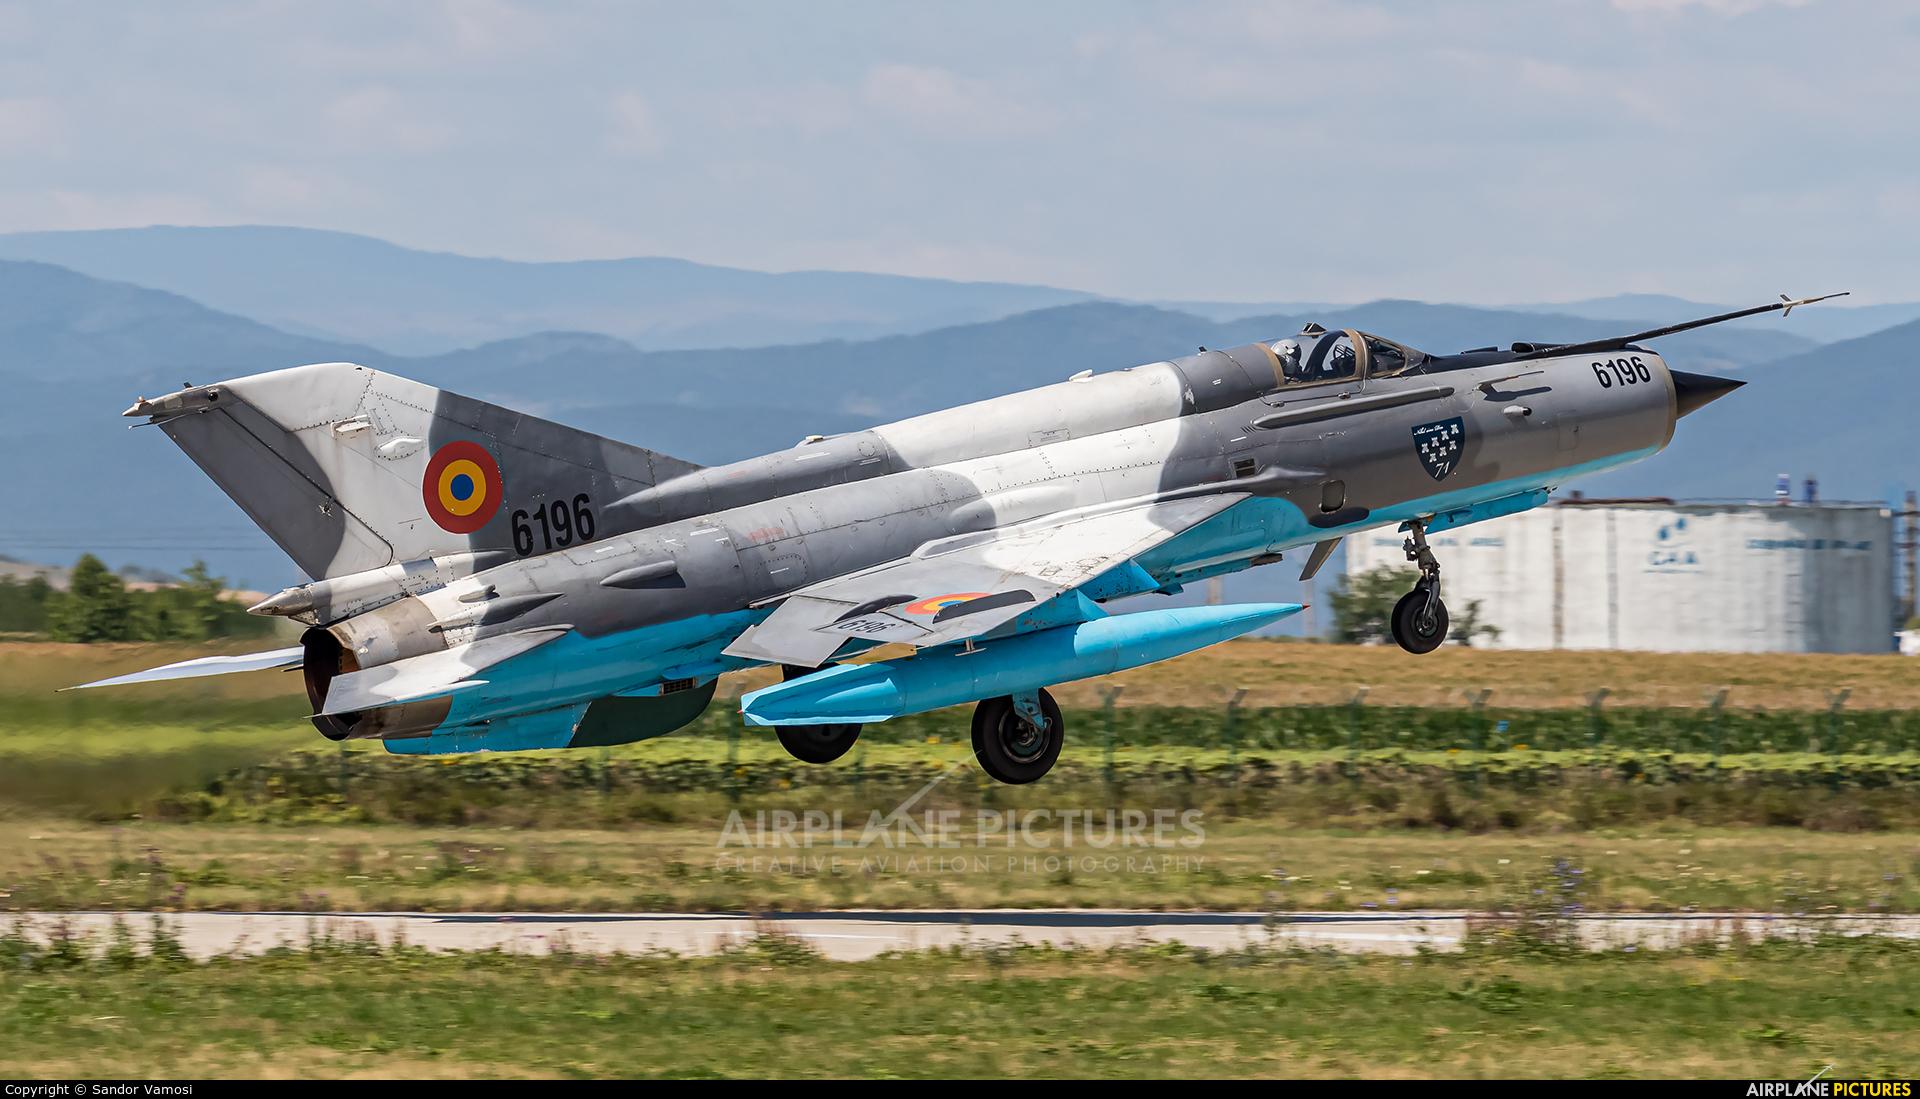 Romania - Air Force 6196 aircraft at Câmpia Turzii